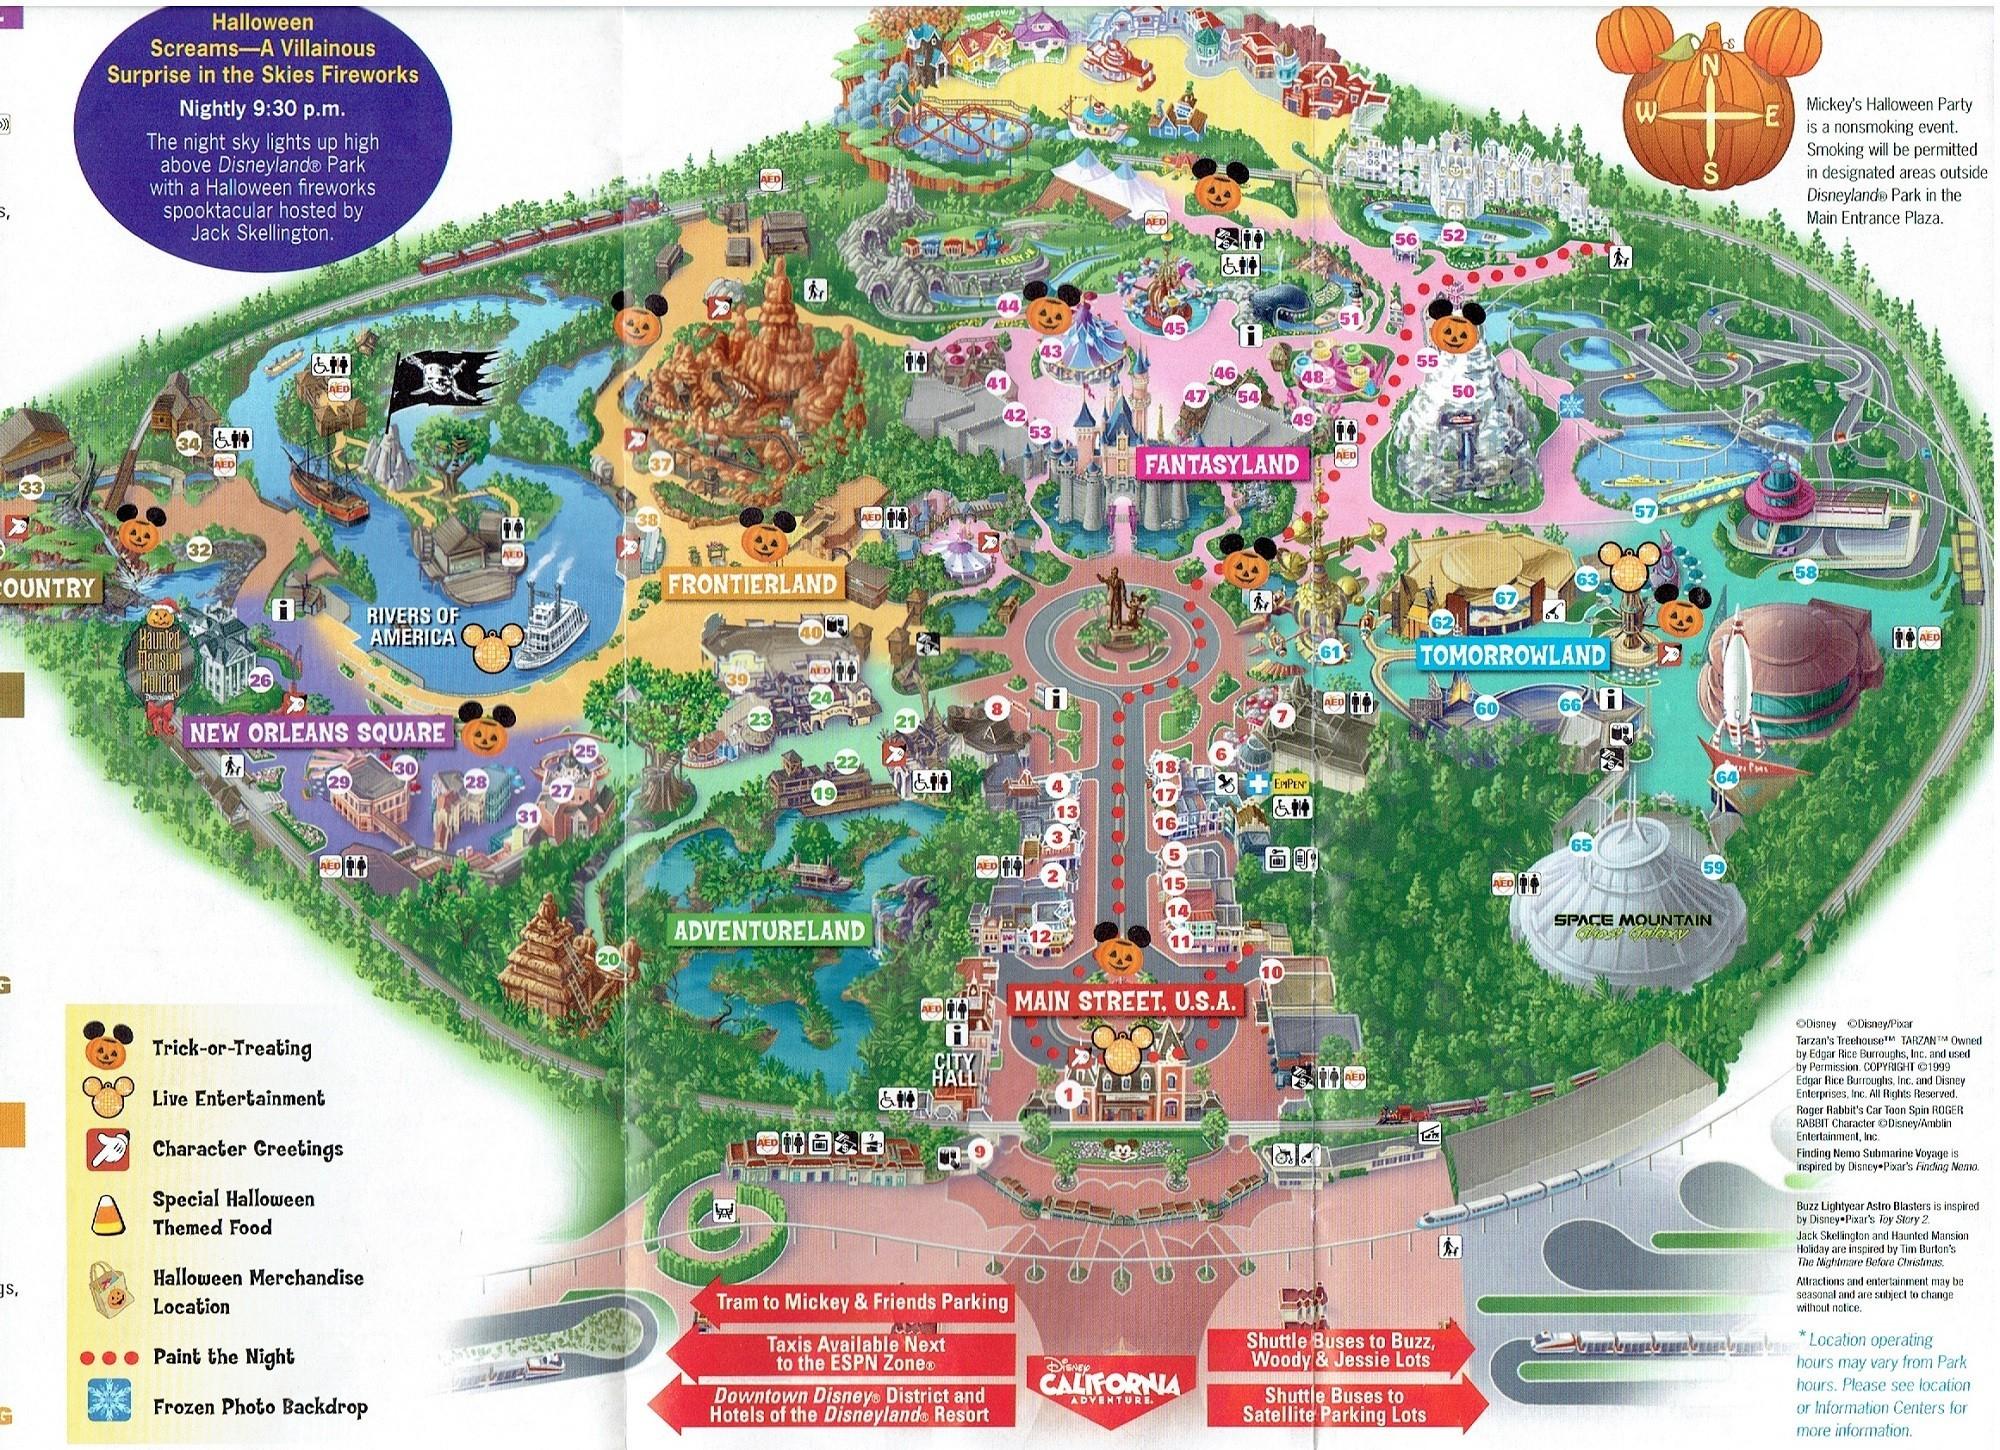 Disney World Florida Map - Mobilacomanda - Disney Parks Florida Map